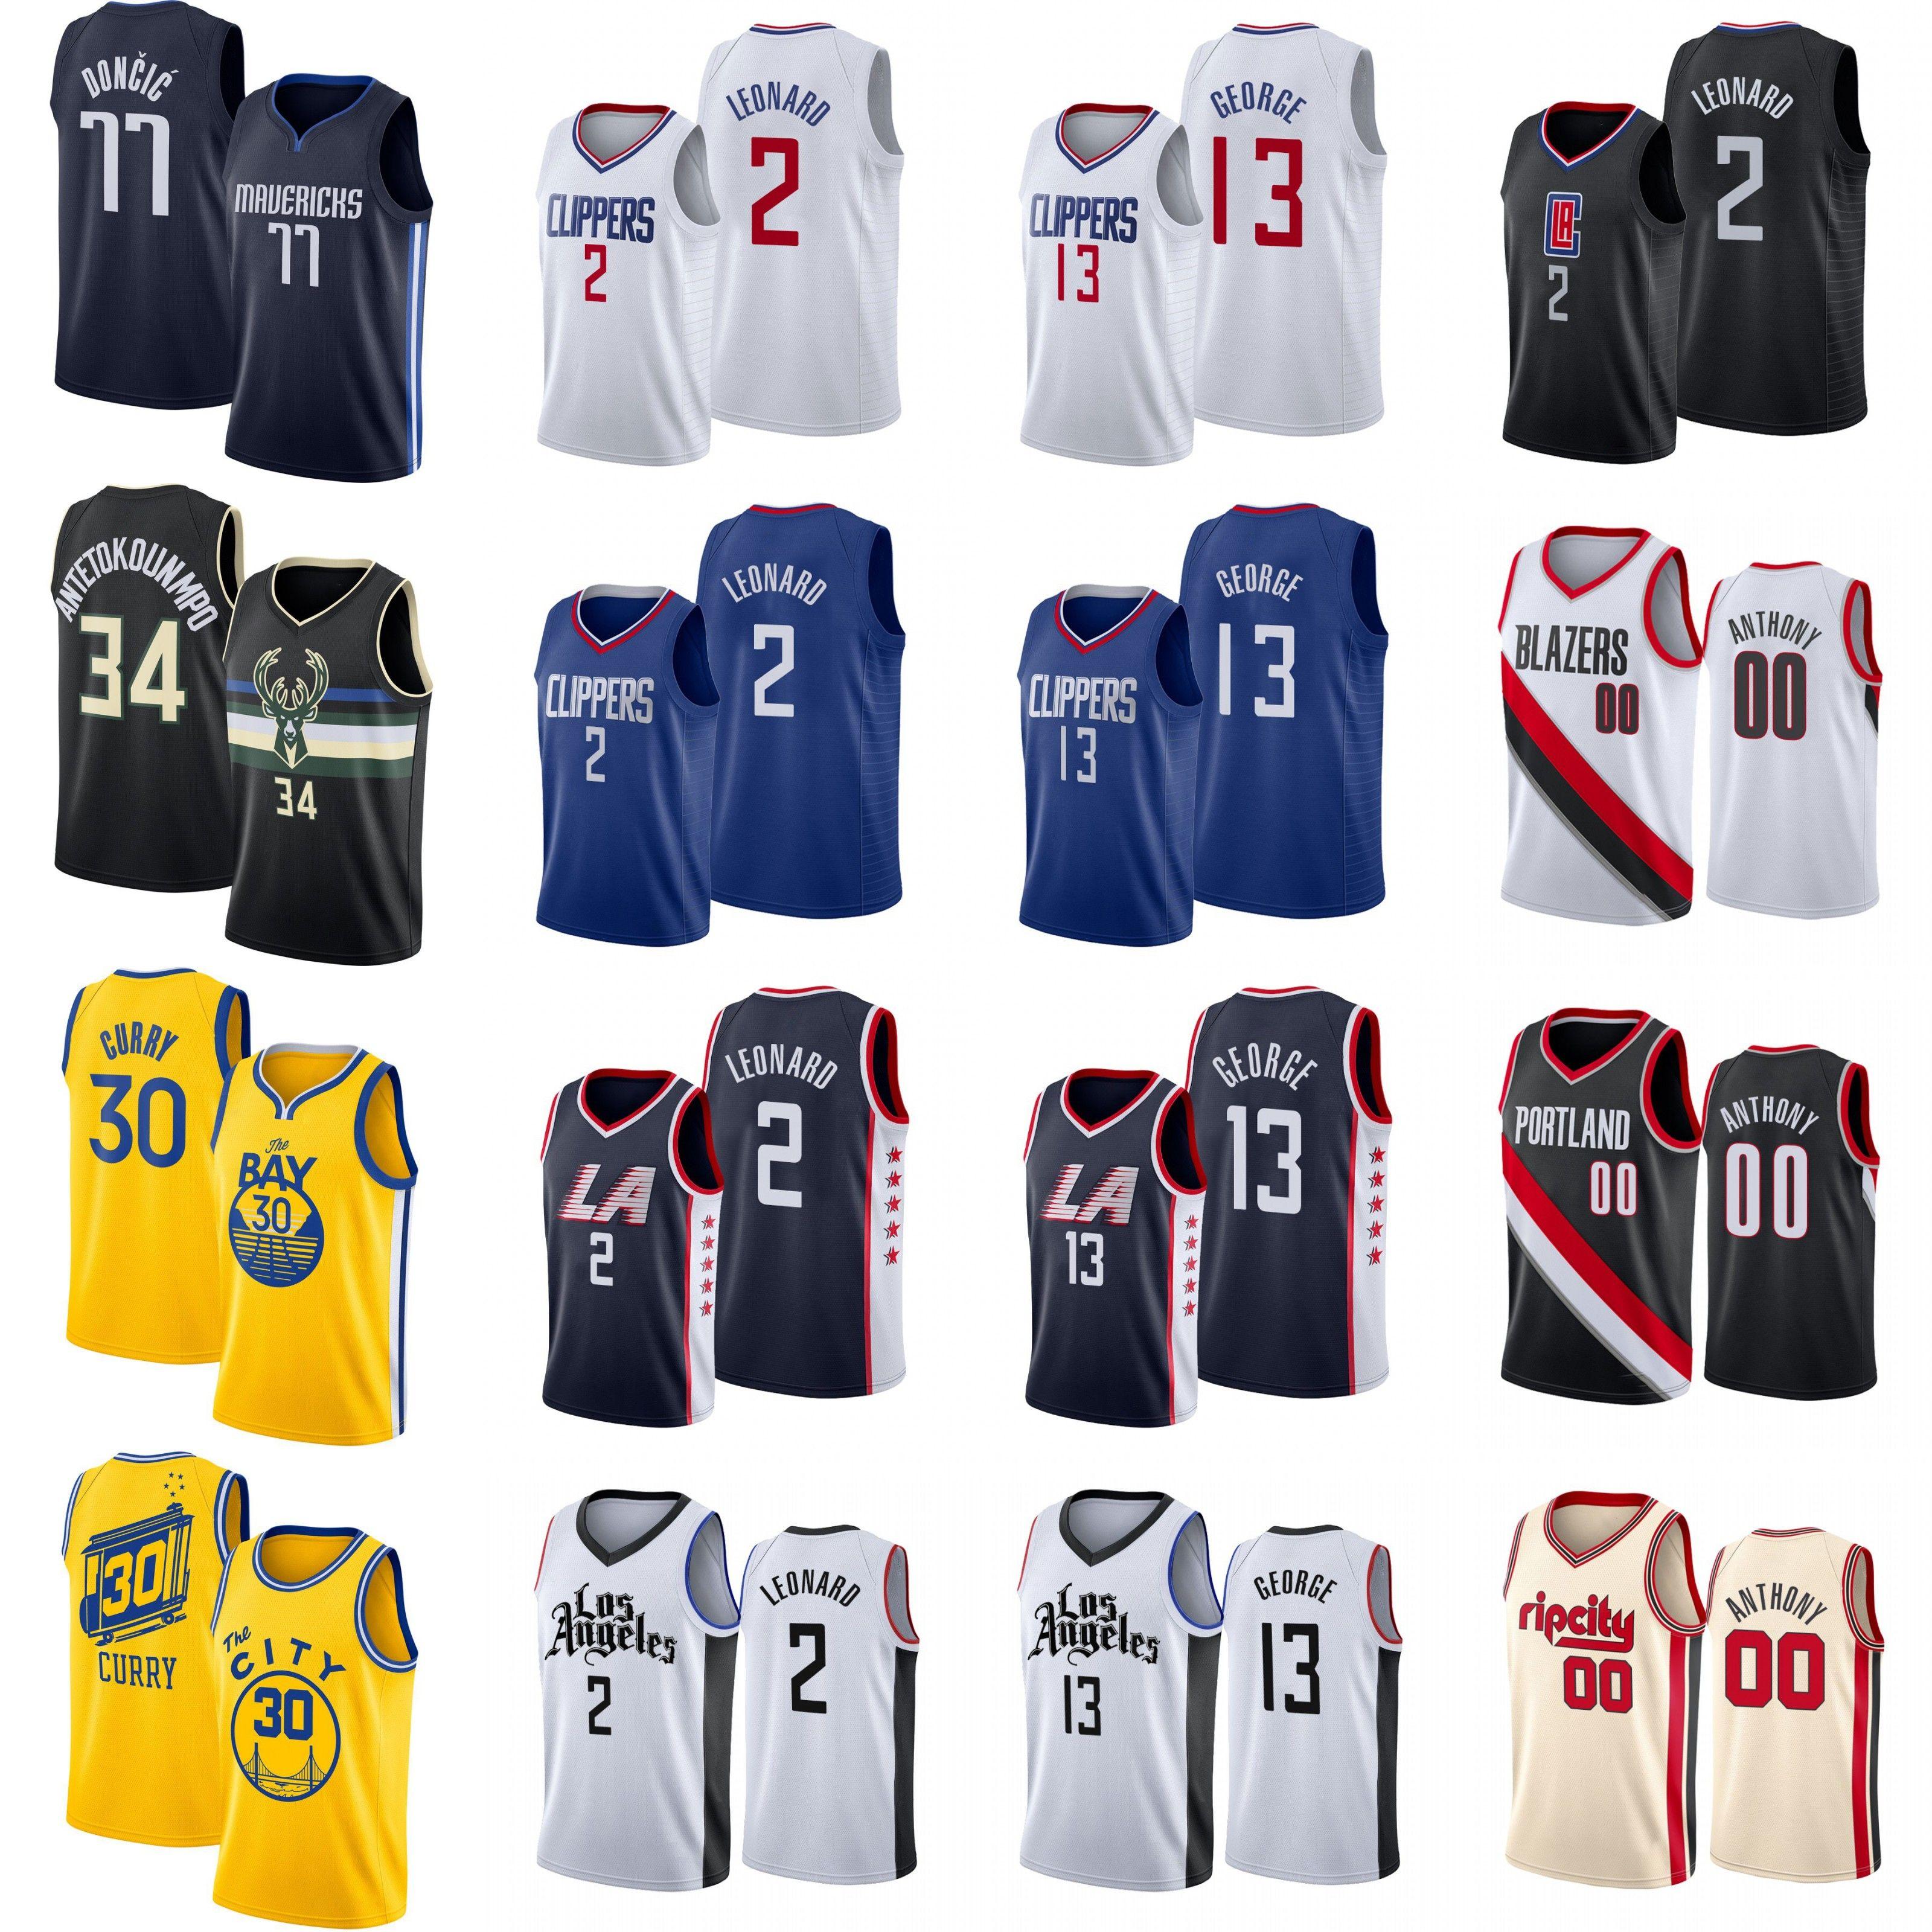 Carmelo Anthony 00 camisetas de baloncesto Stephen Curry 30 2 13 escolares Leonard Paul George Giannis 34 Antetokounmpo 77 Doncic NCAA Instituto de